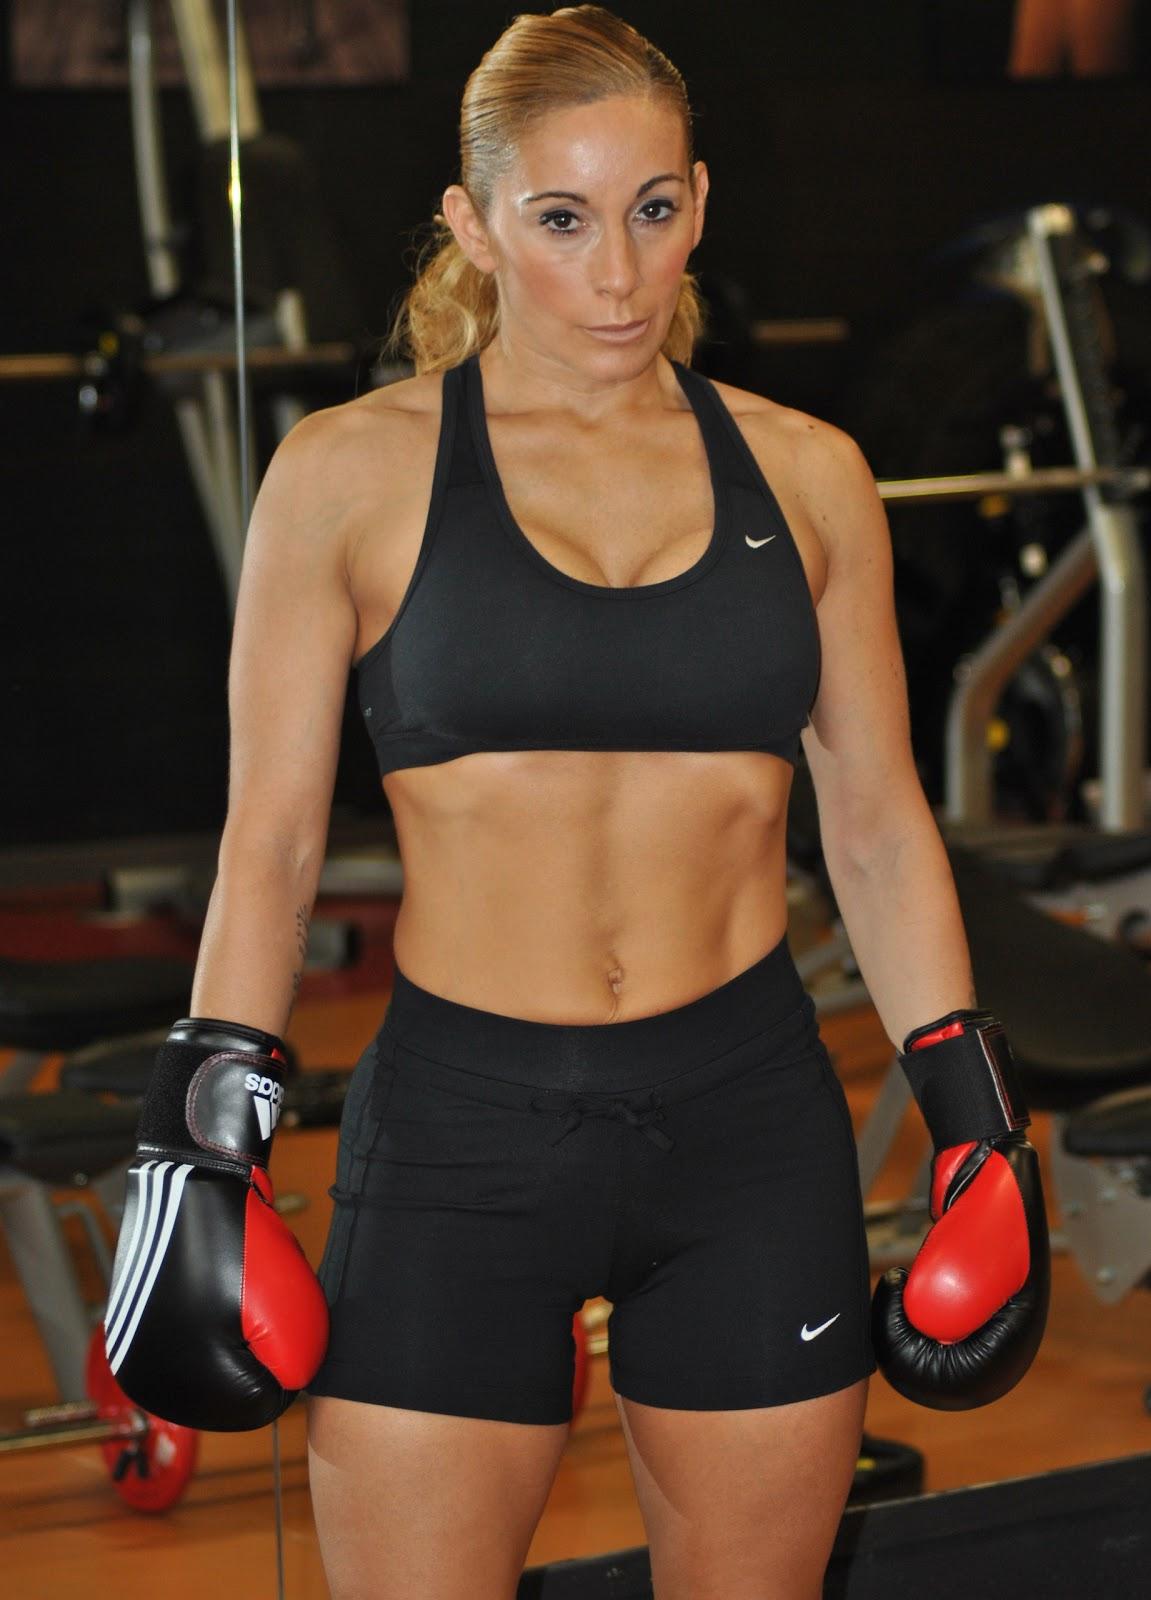 Dieta proteica para ganar masa muscular mujer picture 6